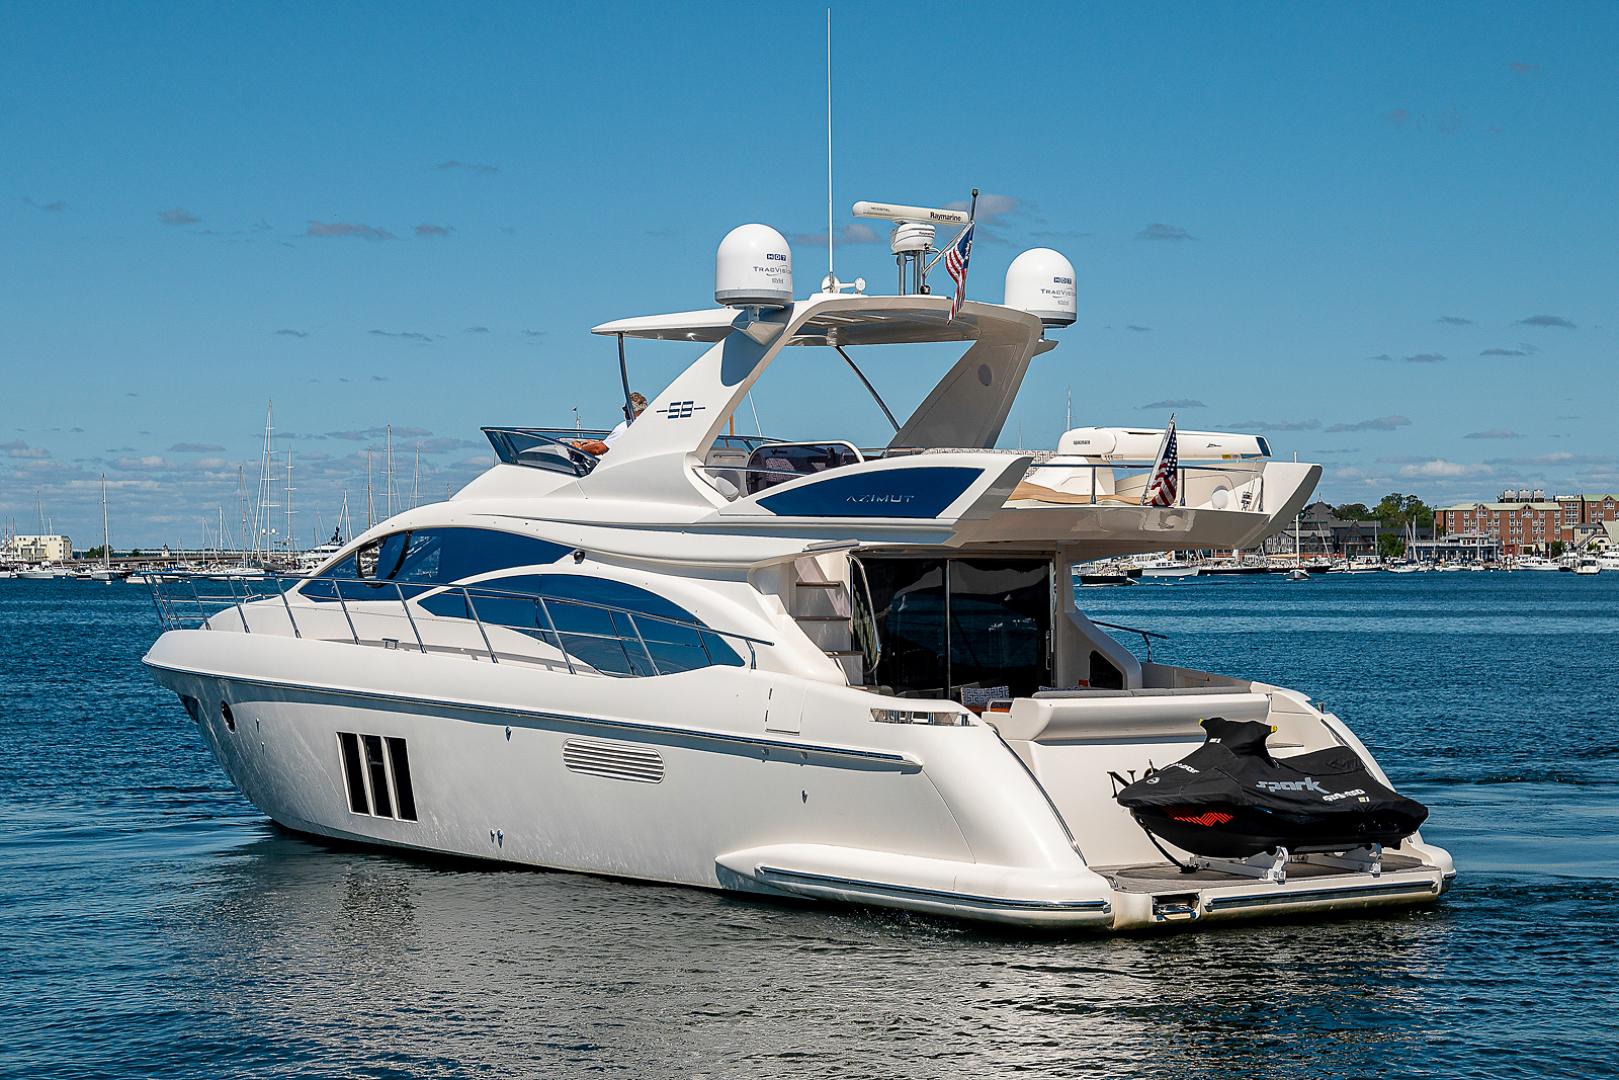 Azimut-58 Fly Motor Yacht 2011-Nova Fort Lauderdale-Florida-United States-58_azimut_nova__profiles12-1490552 | Thumbnail